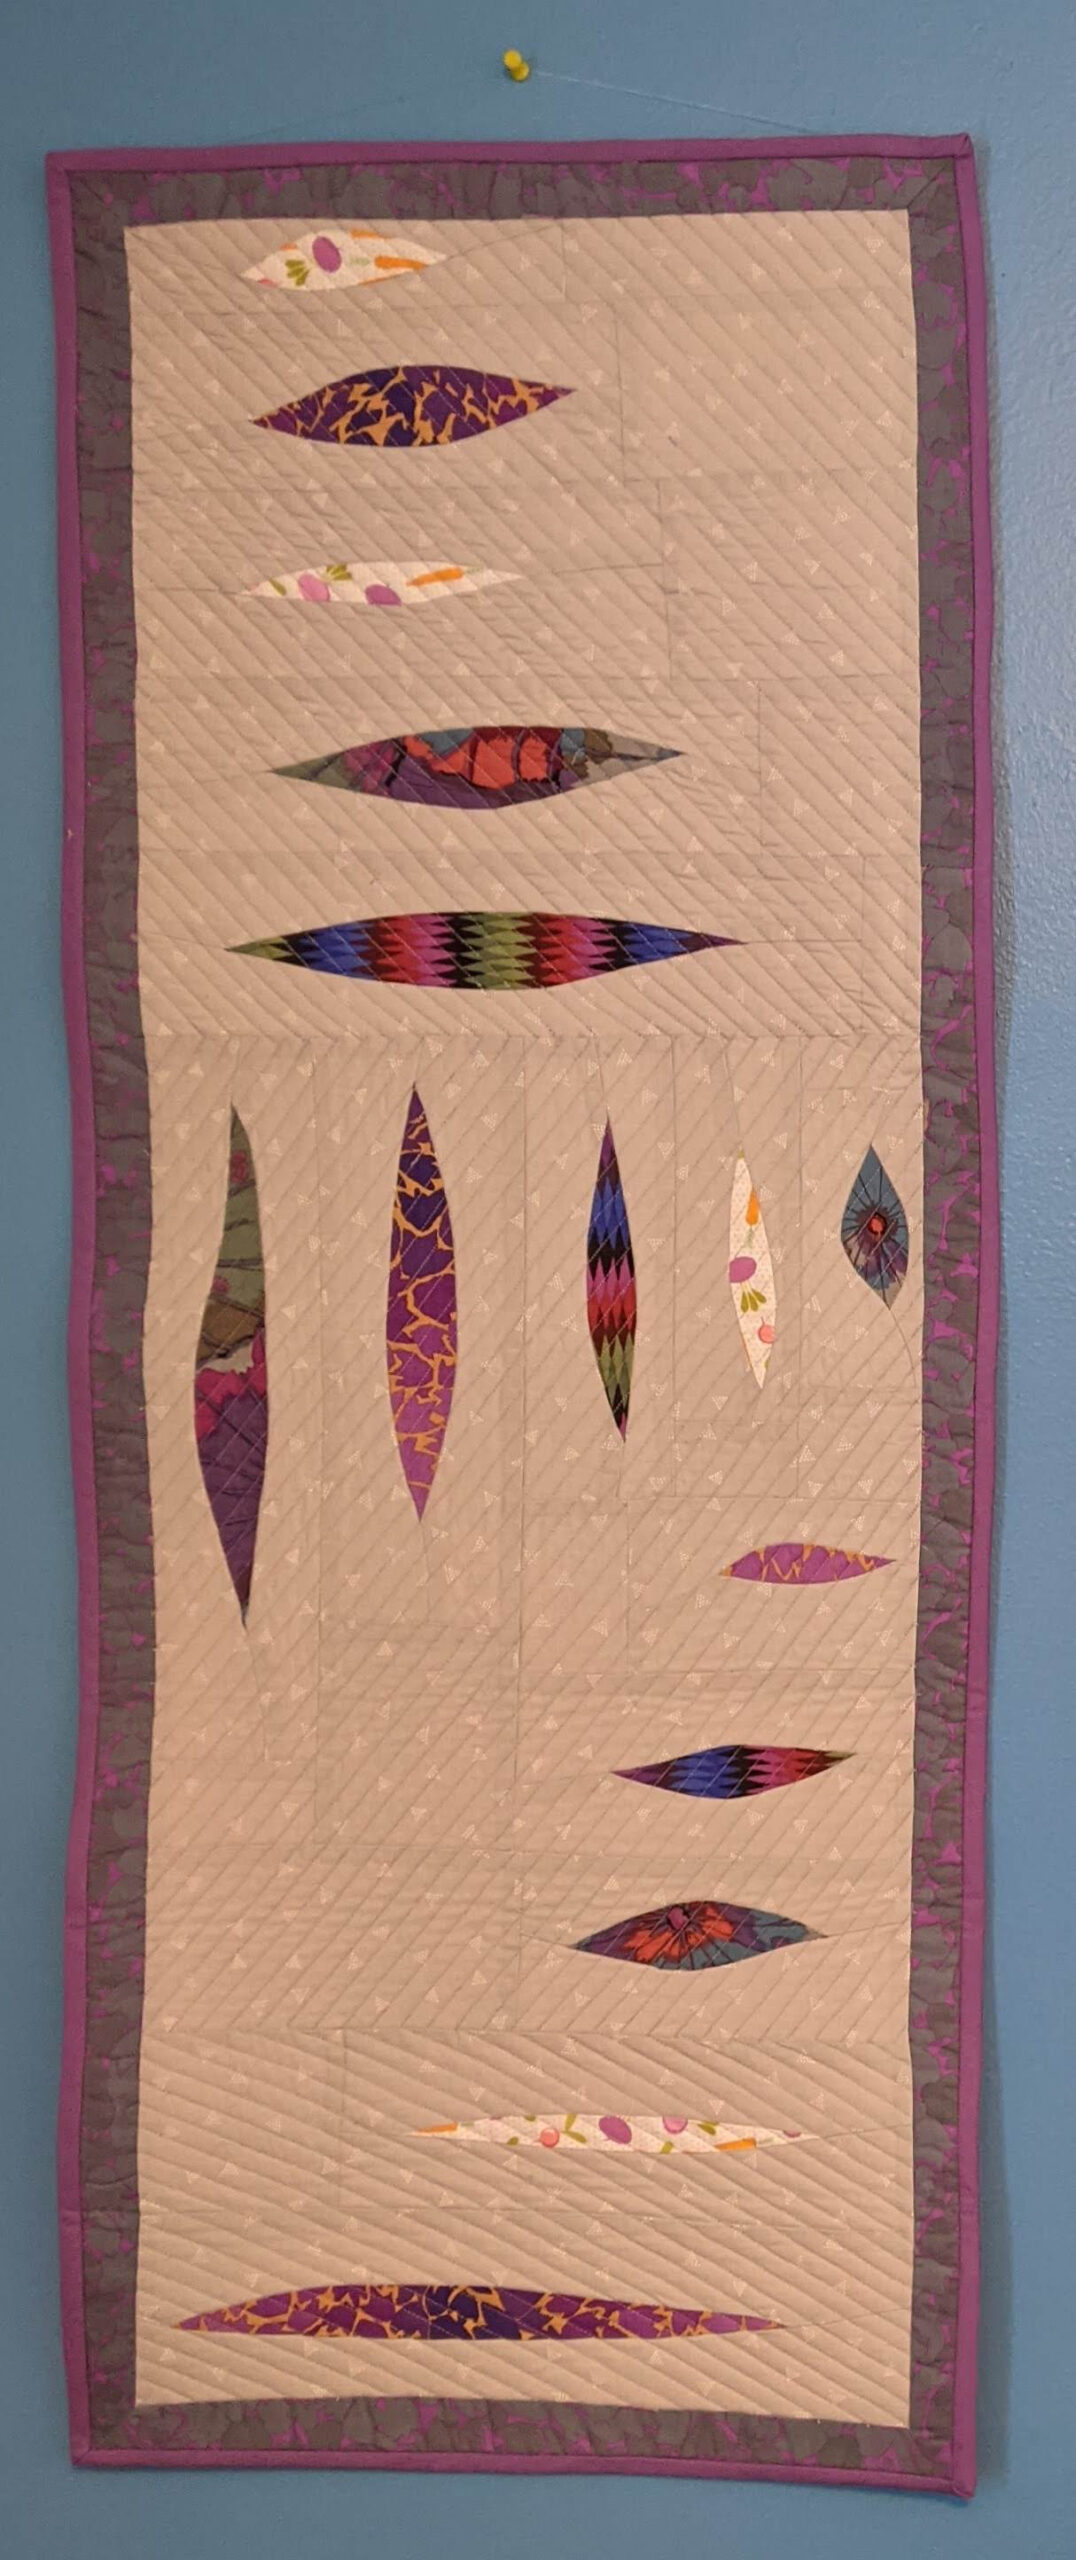 Wall hanging quilt by Dr. Nancy Fiedler for Linda Everett